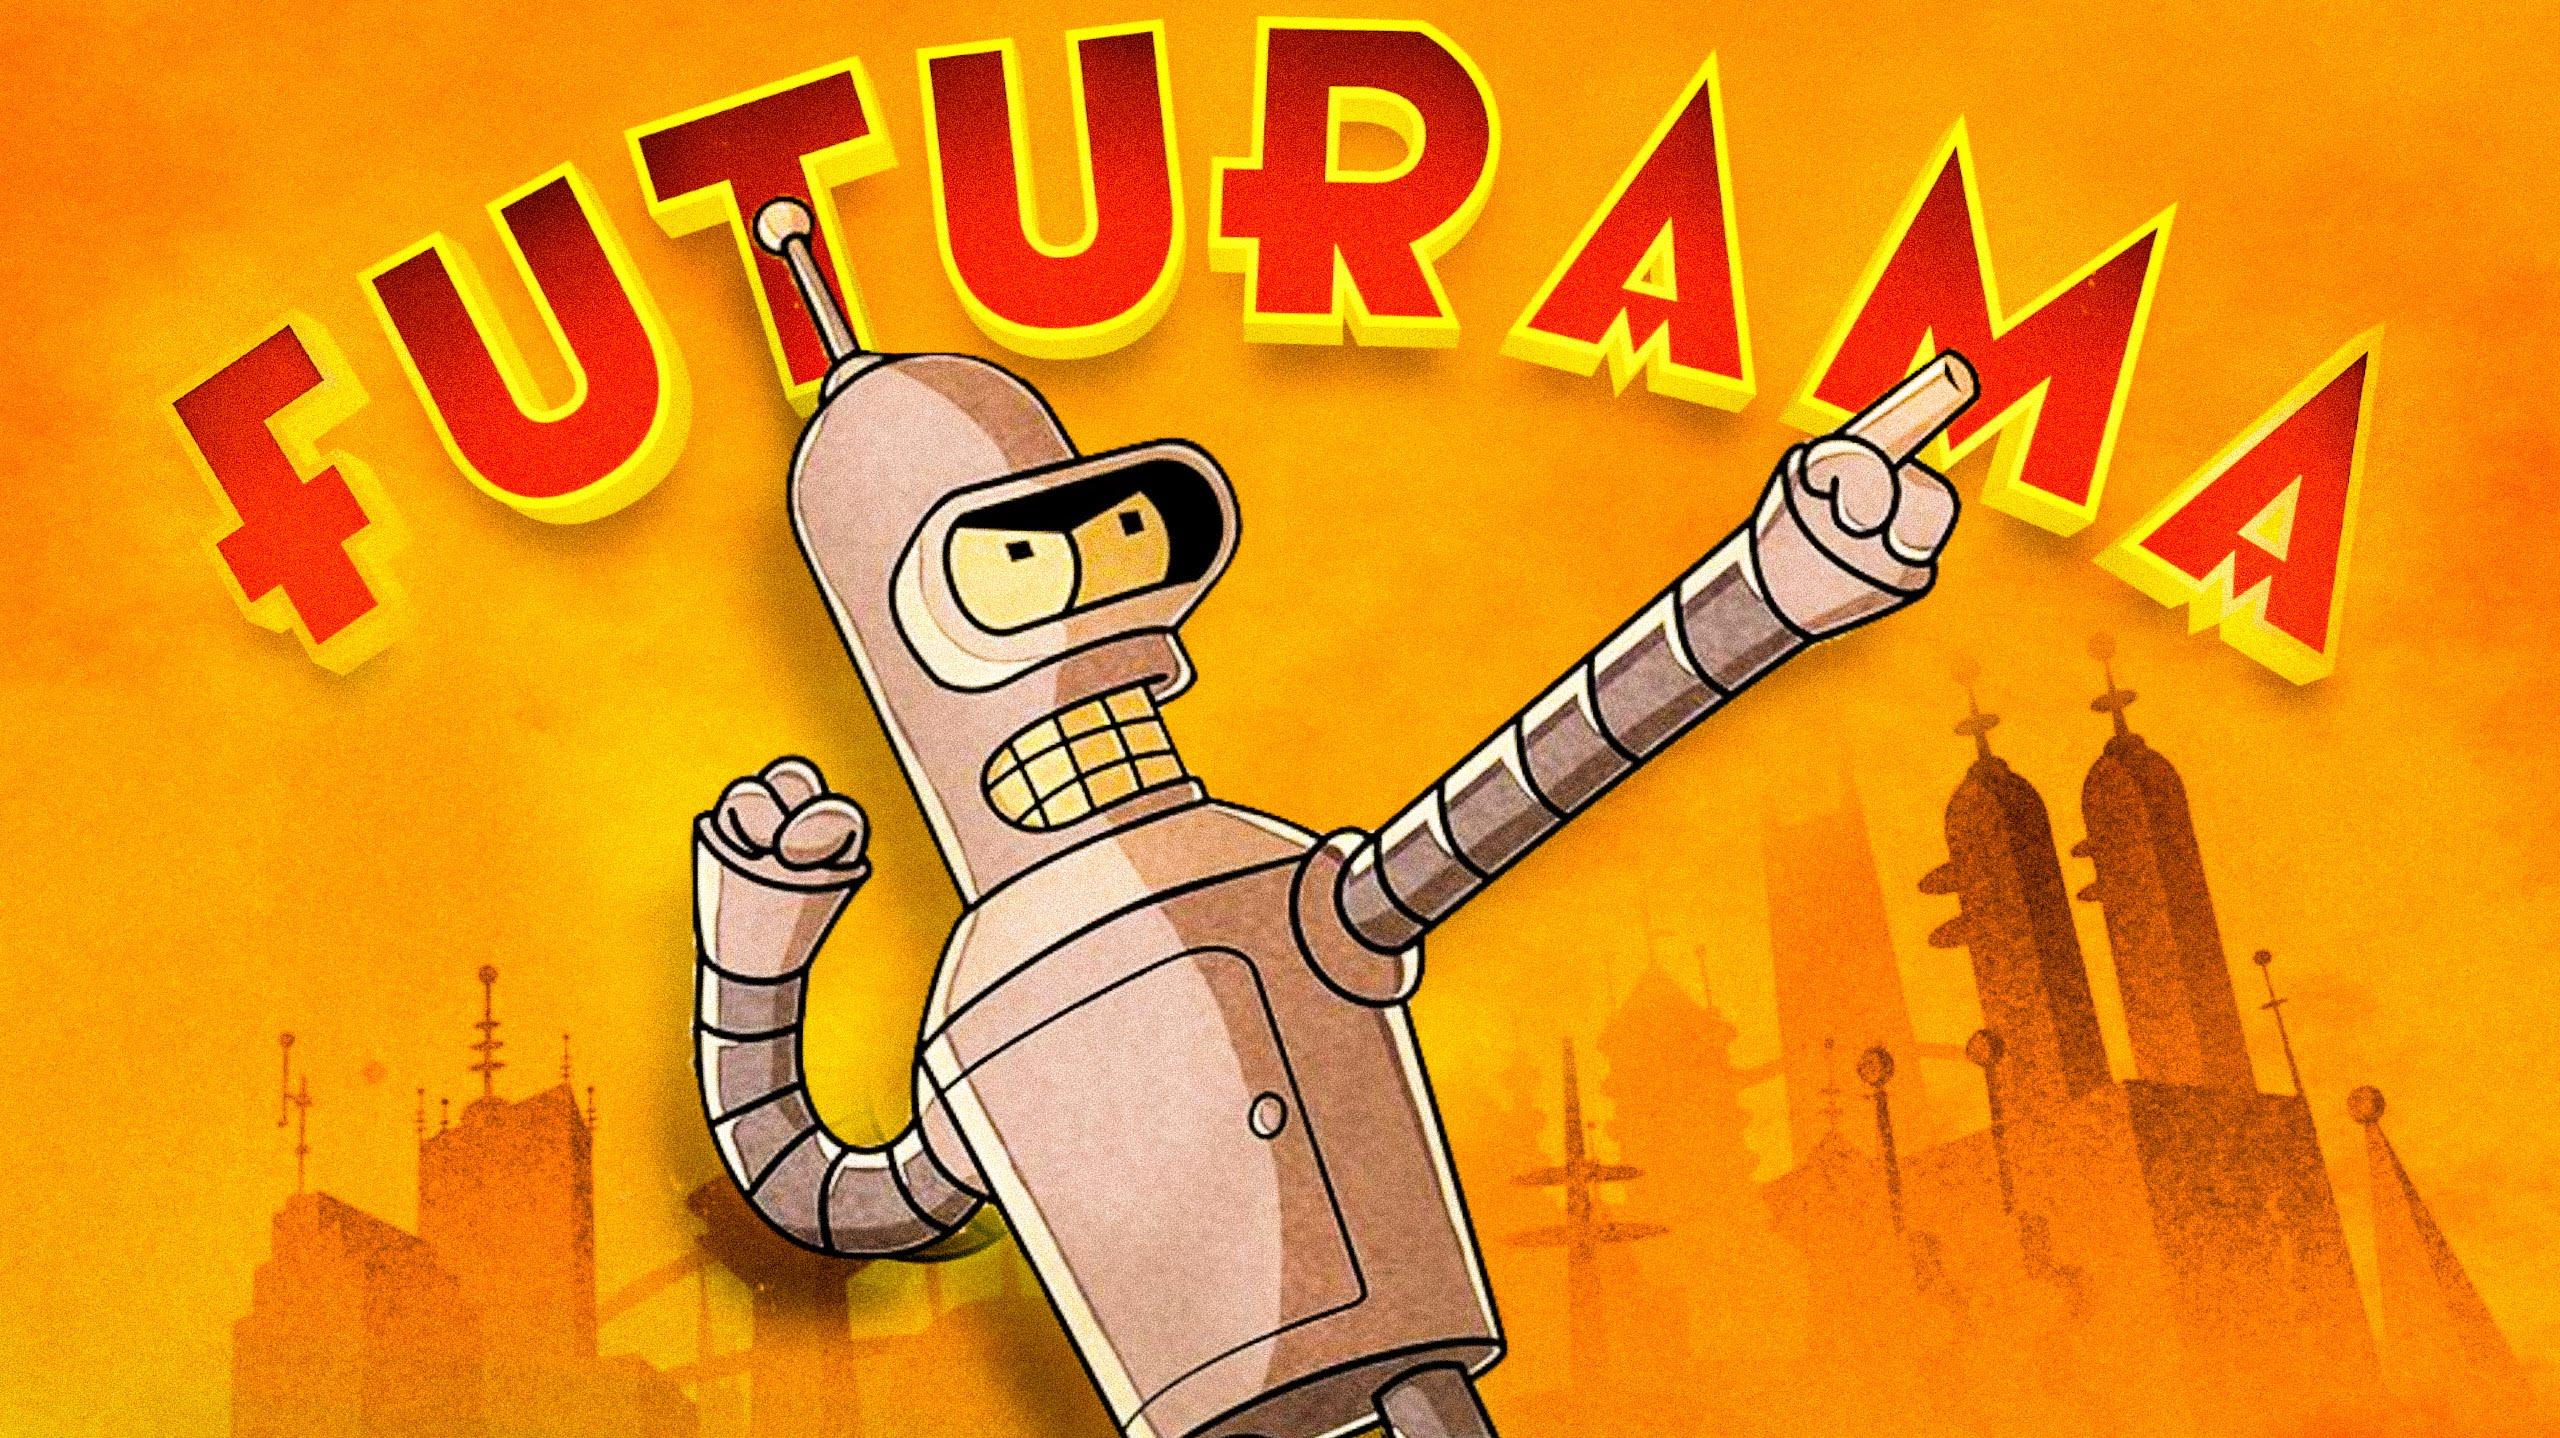 Futurama Backgrounds on Wallpapers Vista